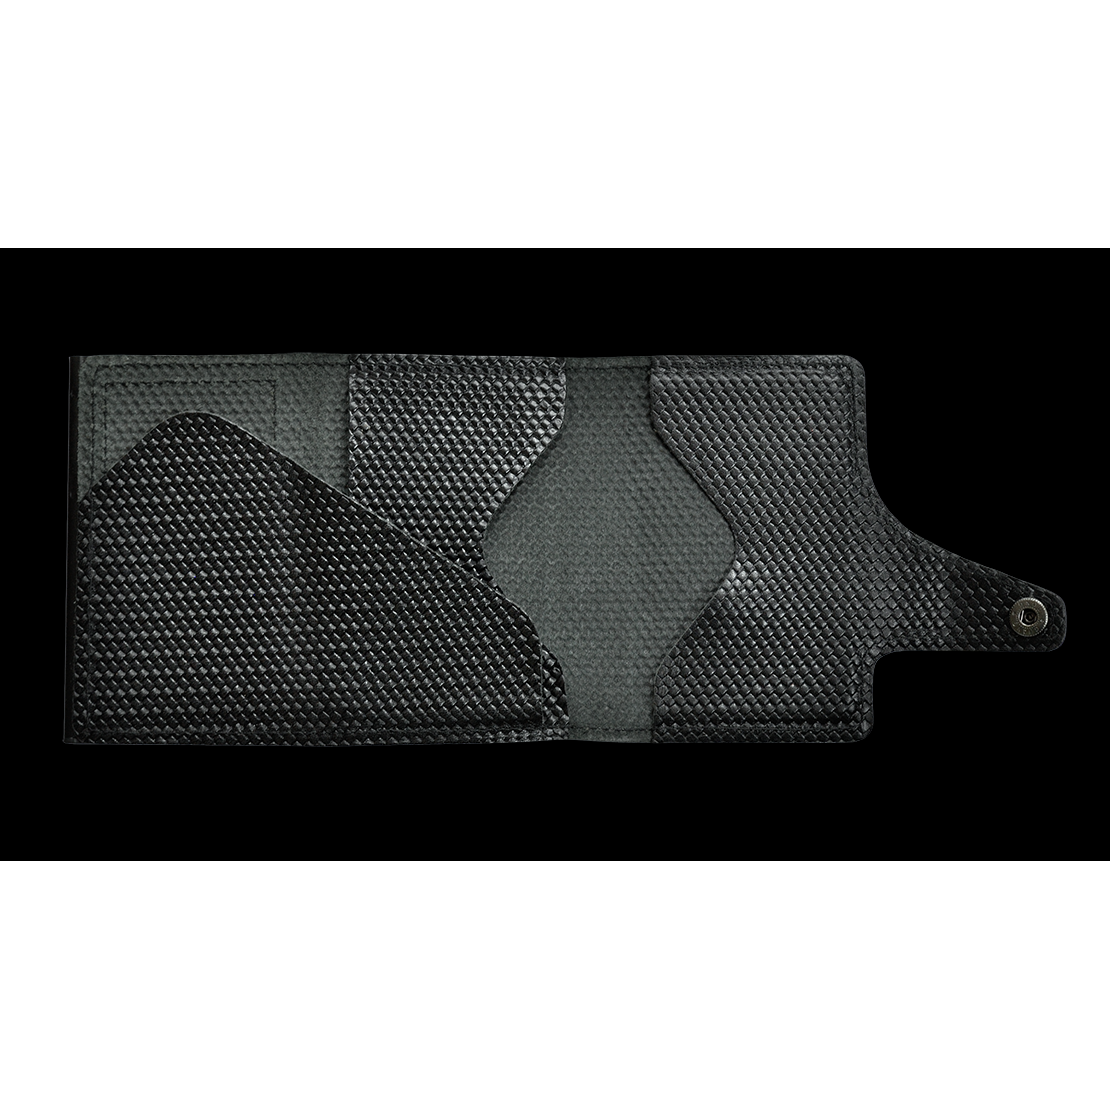 TRU VIRTU Click n Slide Wallet - Carbon